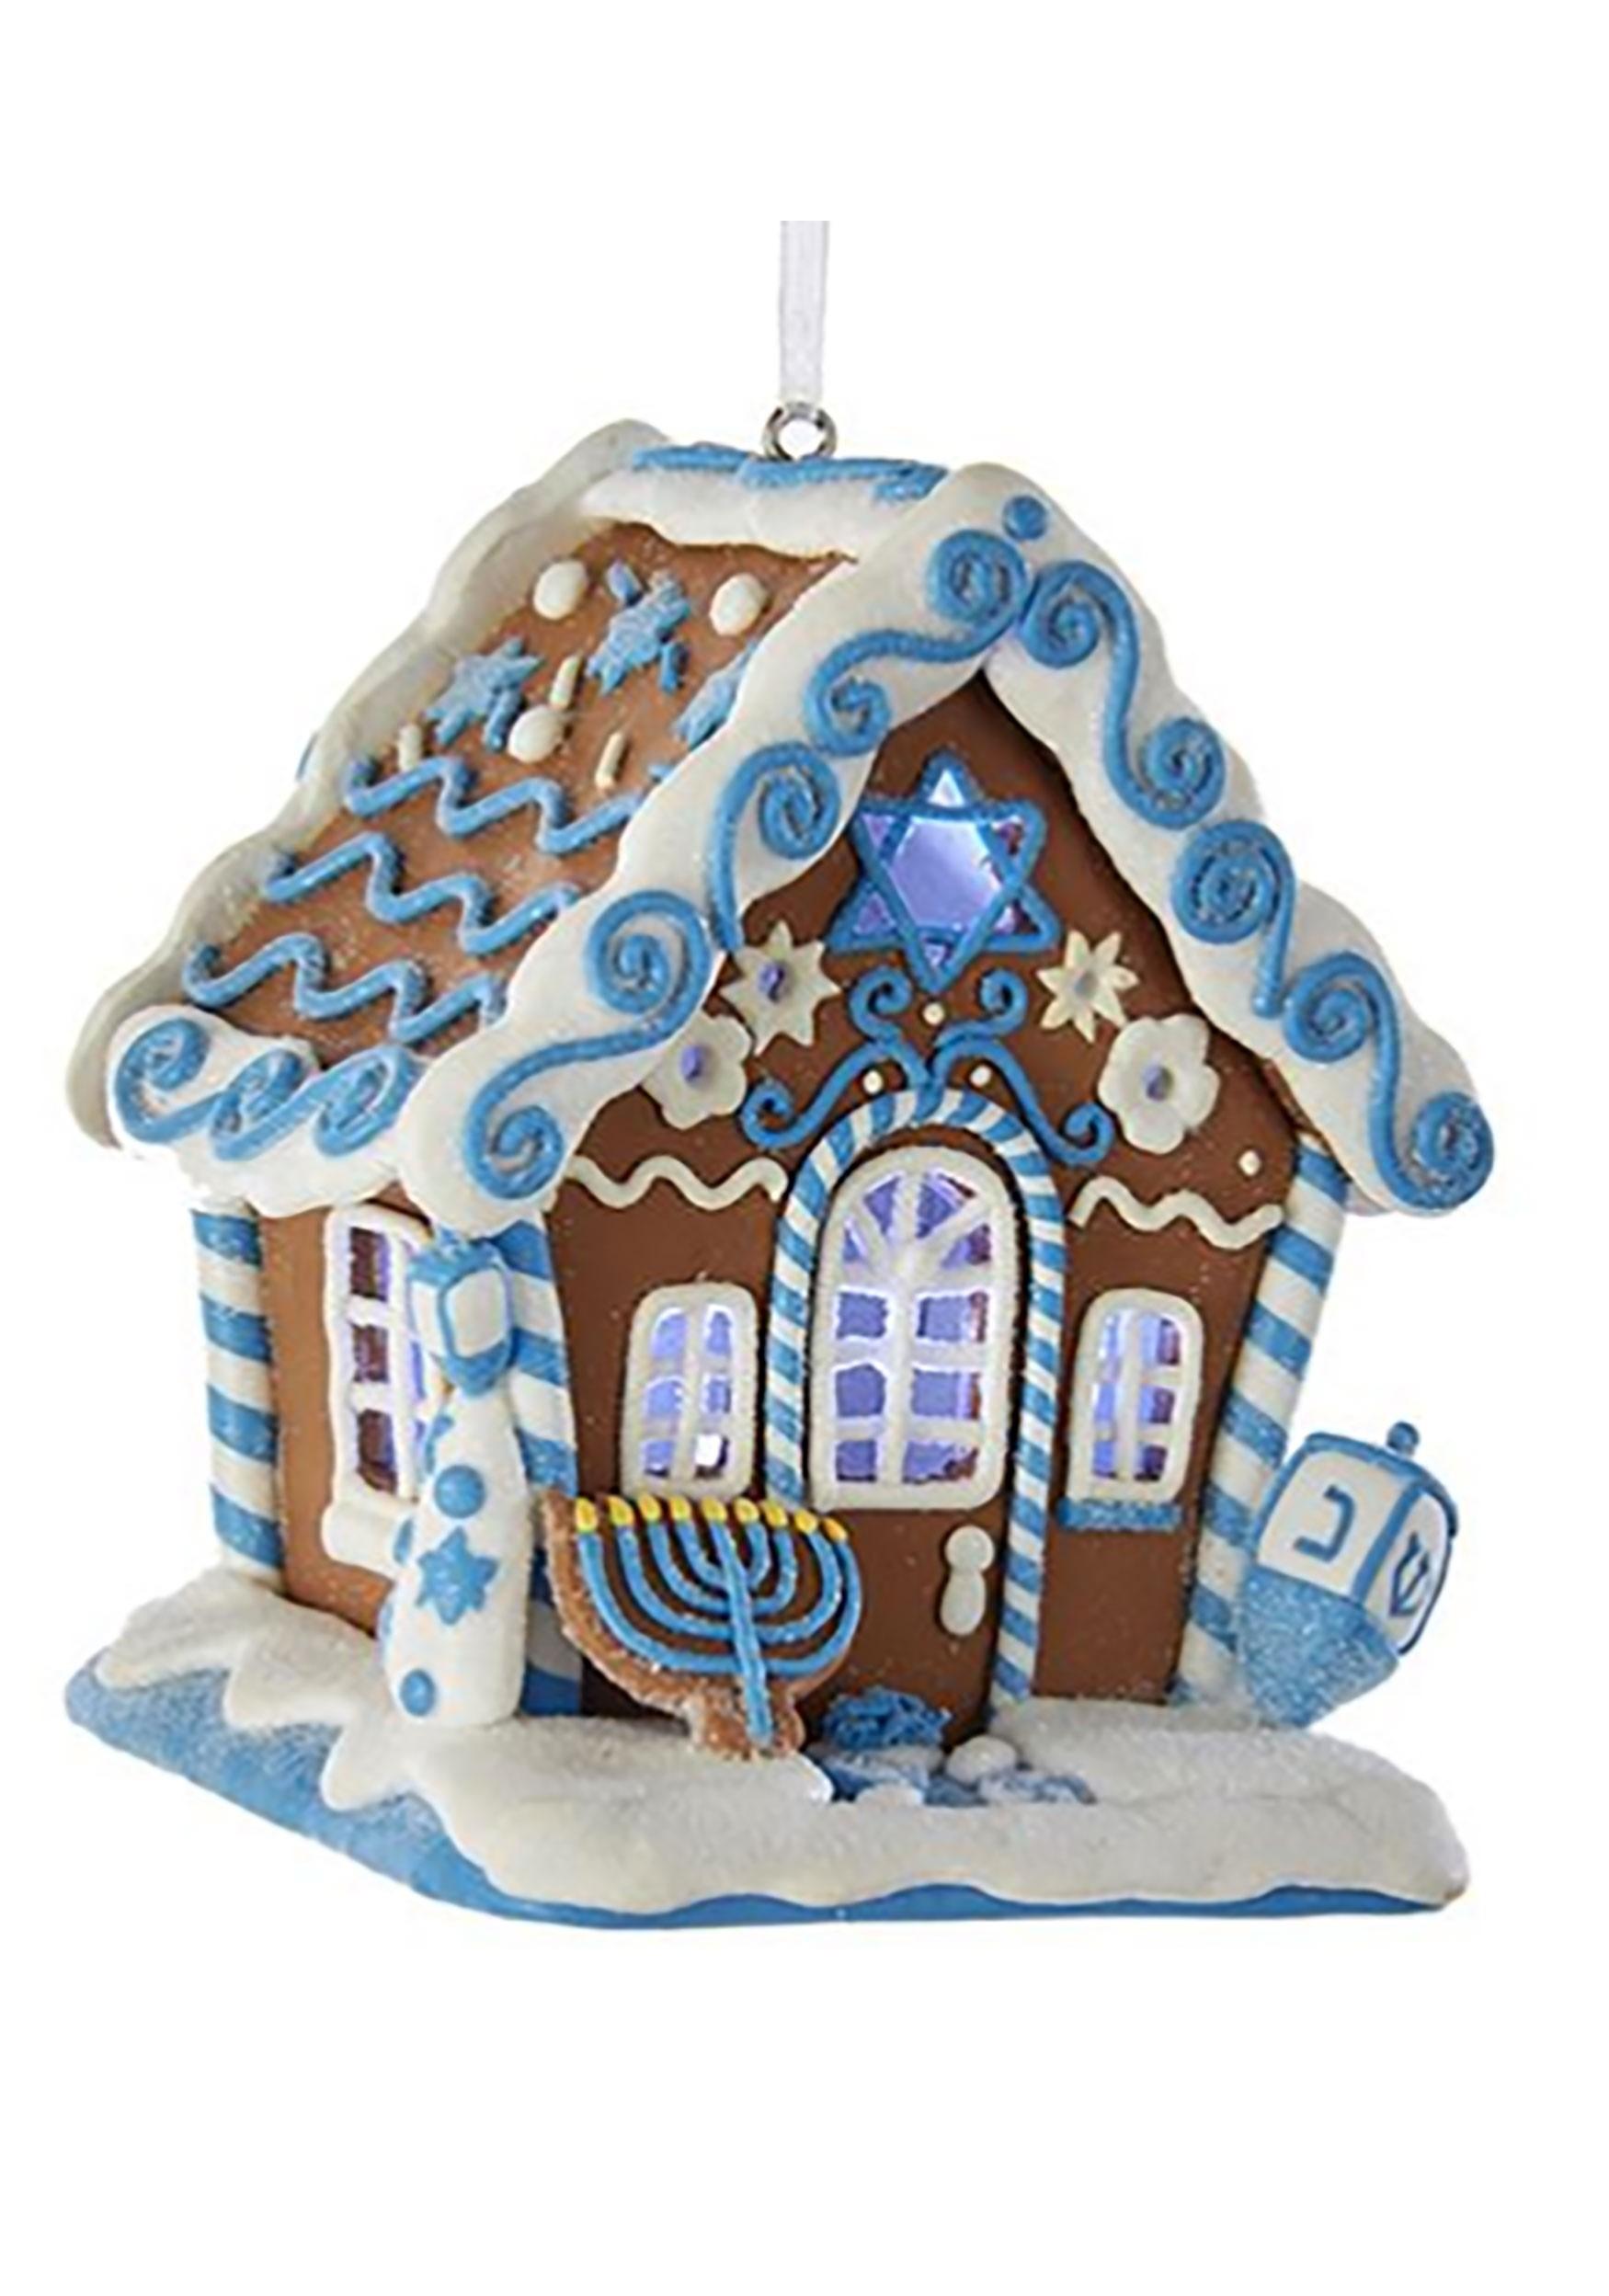 LED Hanukkah Gingerbread House Ornament